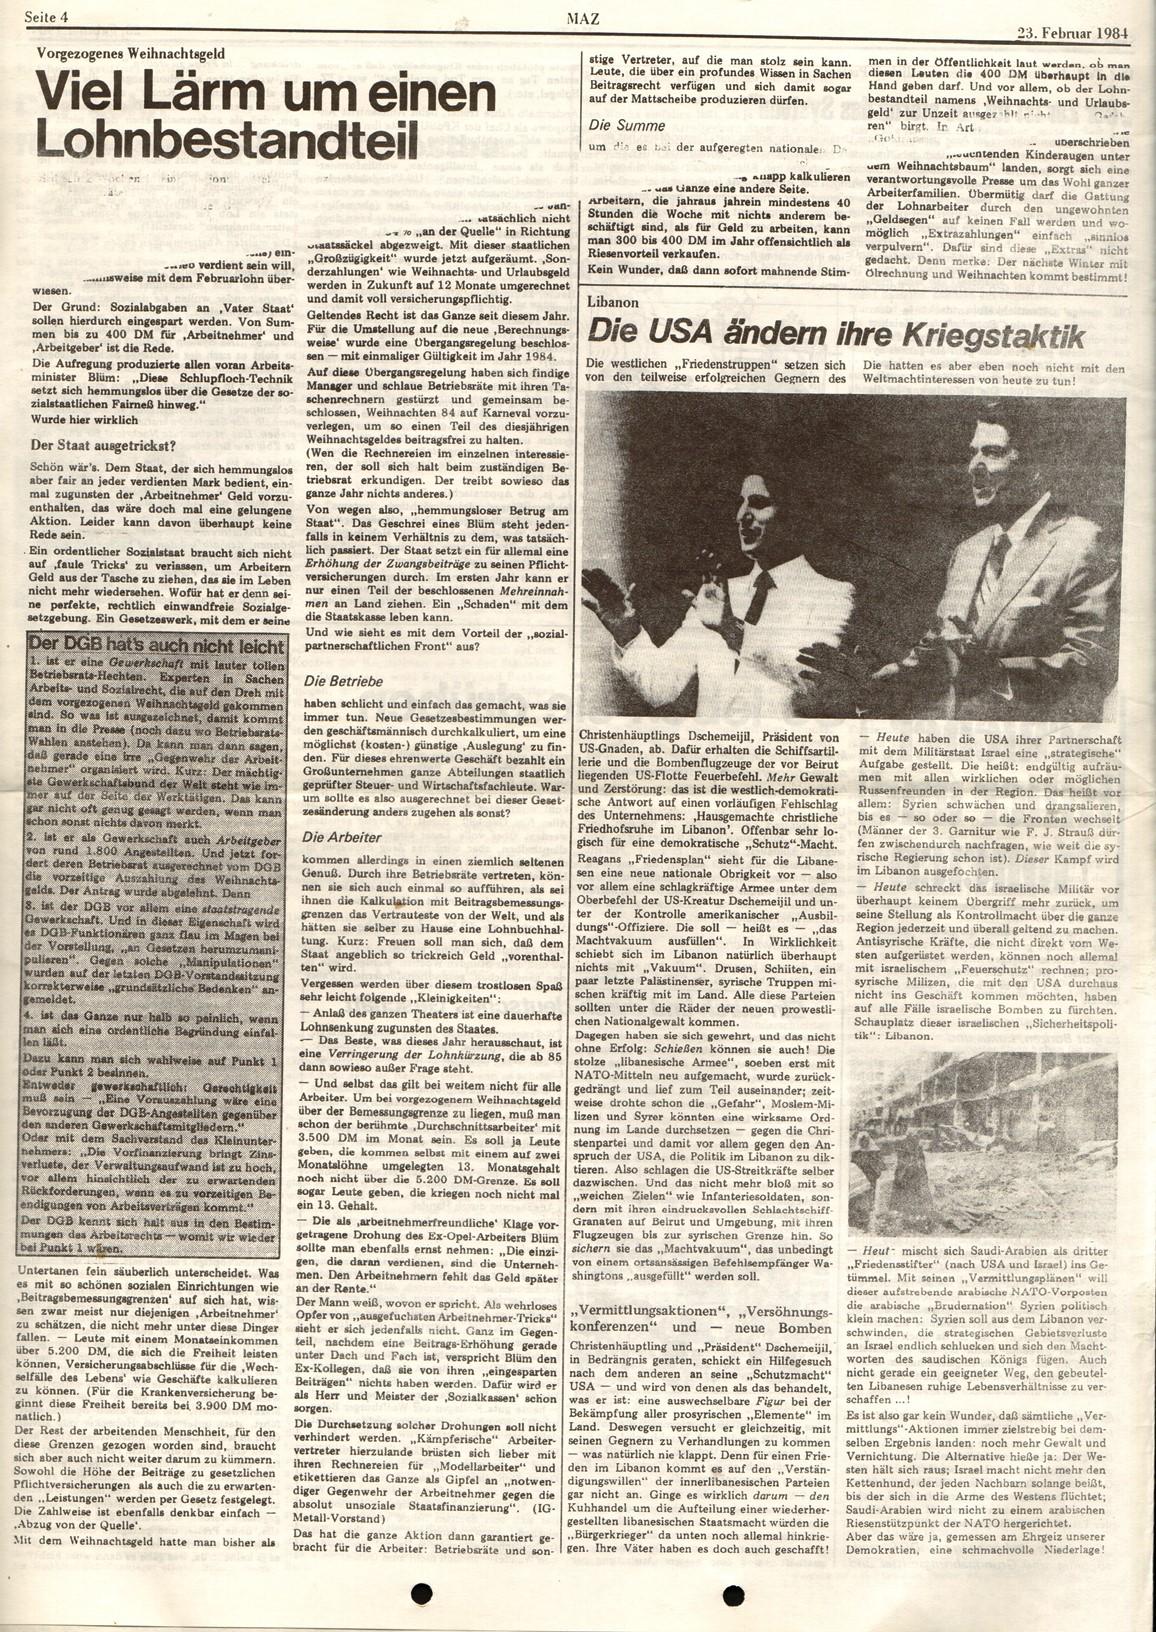 Schweinfurt_MG_MAZ_19840223_04